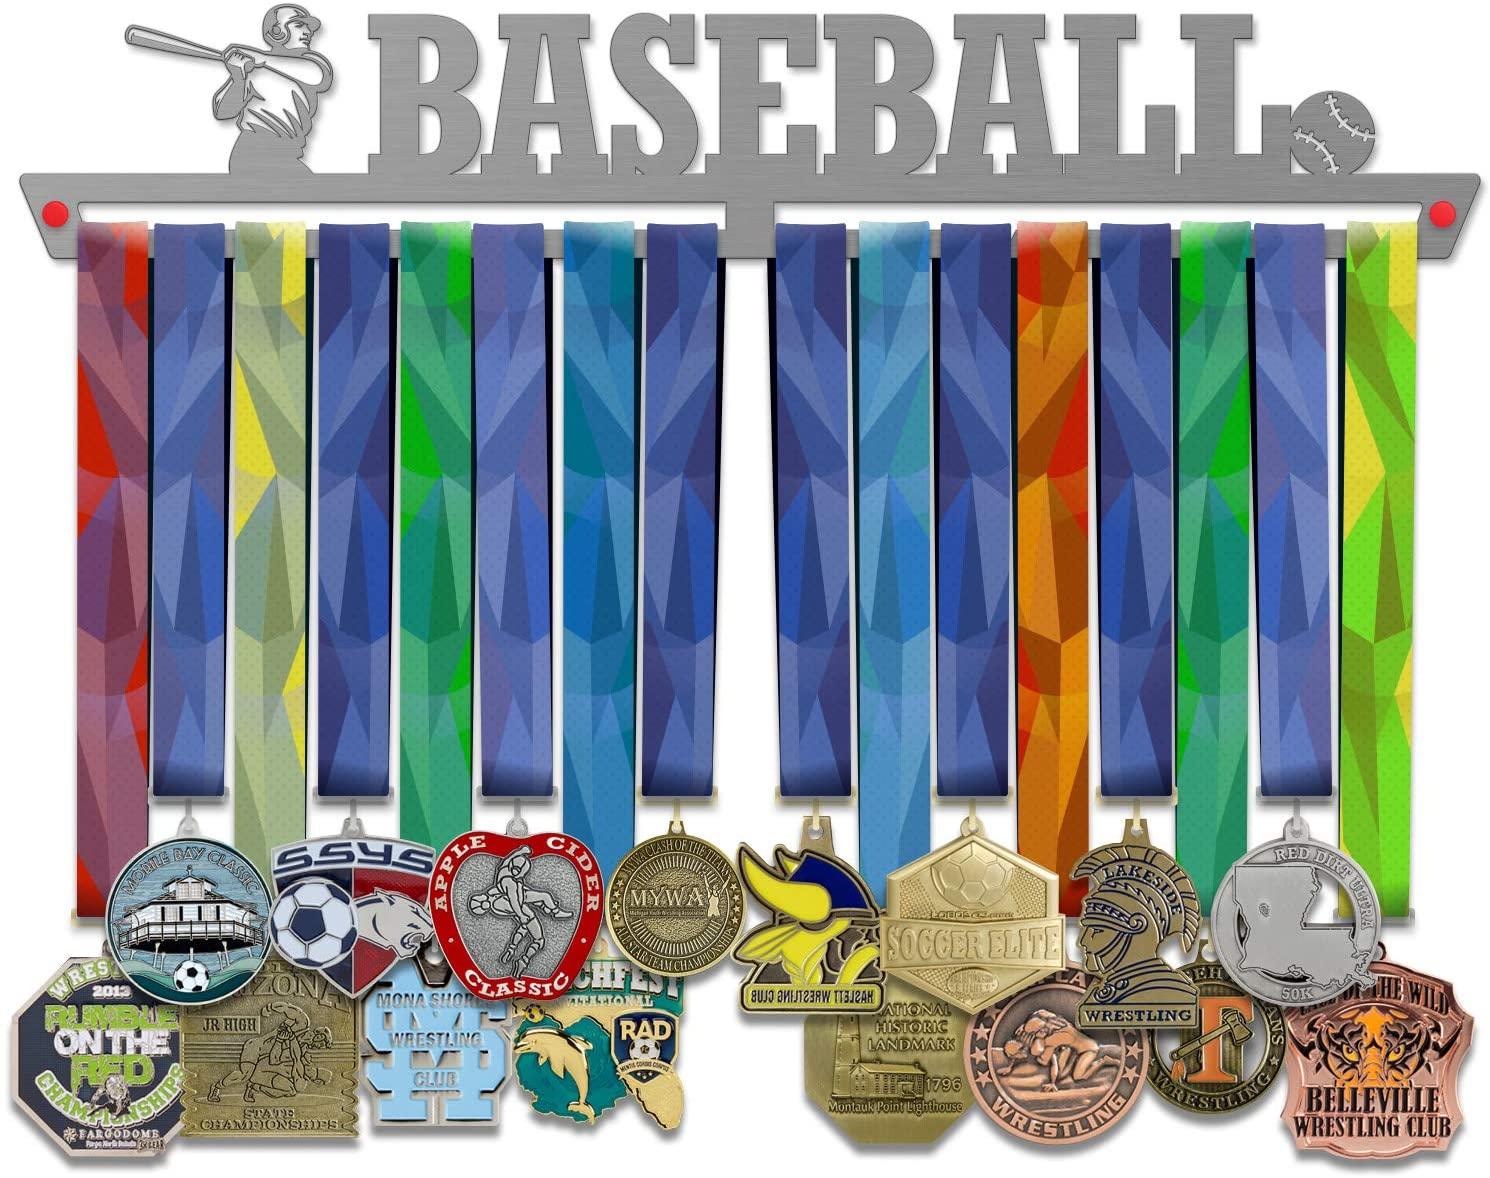 VICTORY HANGERS Baseball Medal Hanger Display V2 - Wall Mounted Award Metal Holder - 100% Stainless Steel Rack for Champions